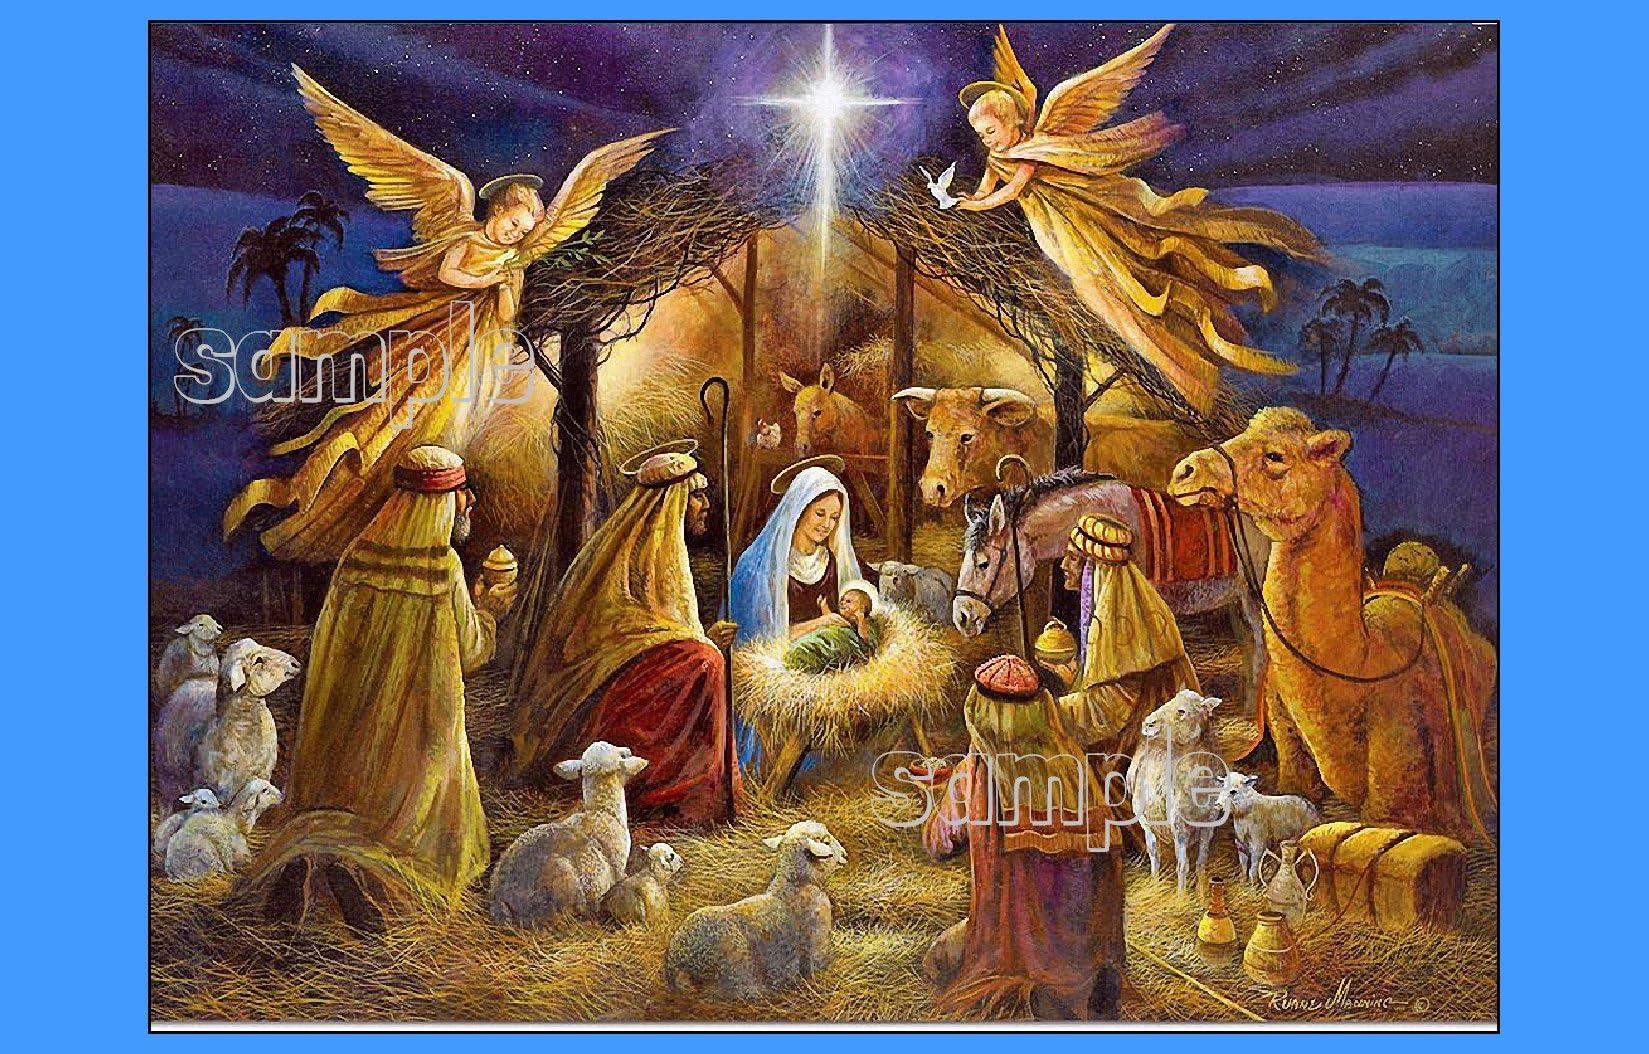 Christmas nativity star scene Cupcake Toppers \u239c happy birthday Jesus party birthday cake epiphany unique Mary Joseph 3 wise men SET OF 12